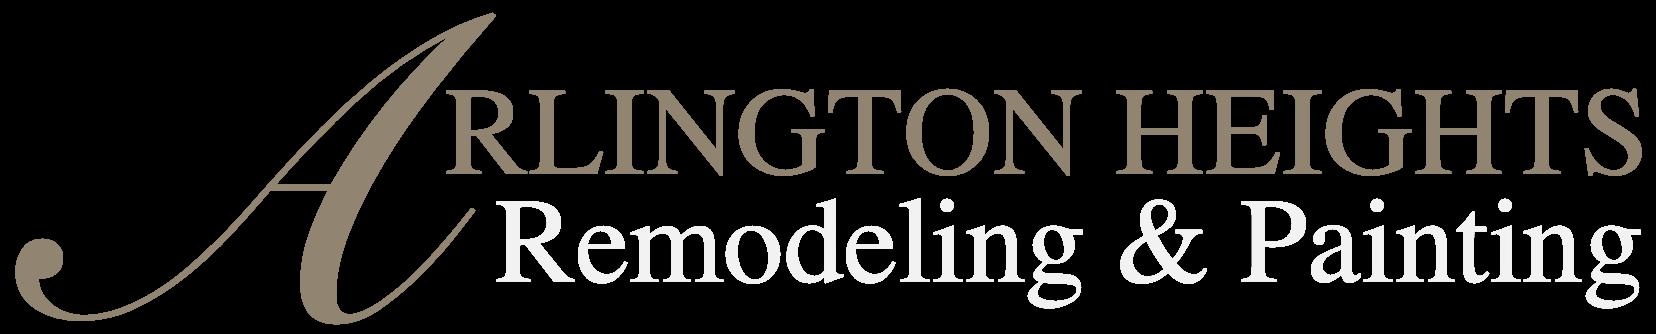 Arlington Heights Remodeling & Painting